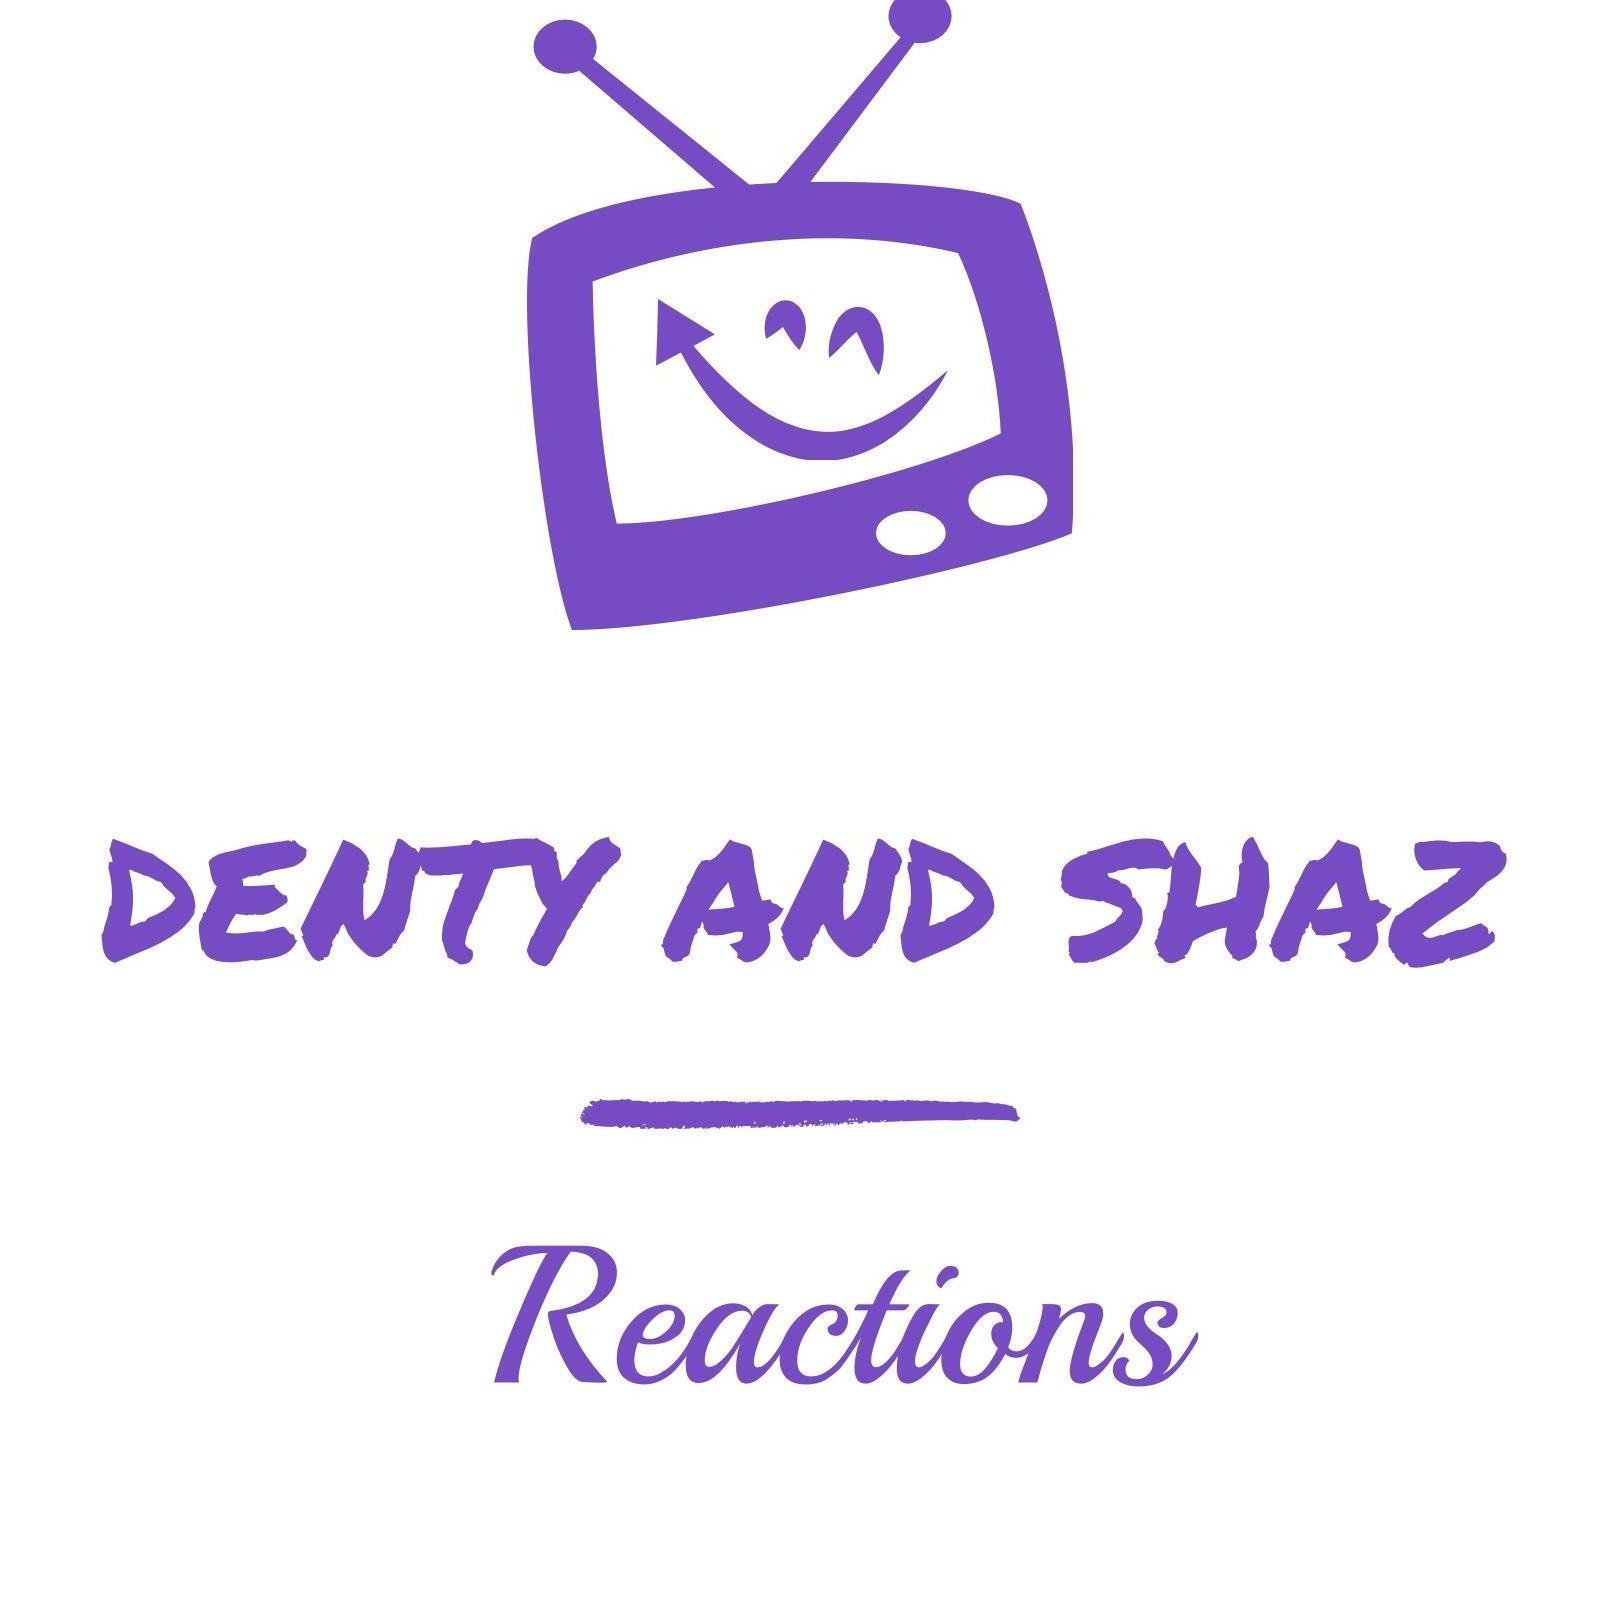 Denty And Shaz Reactions